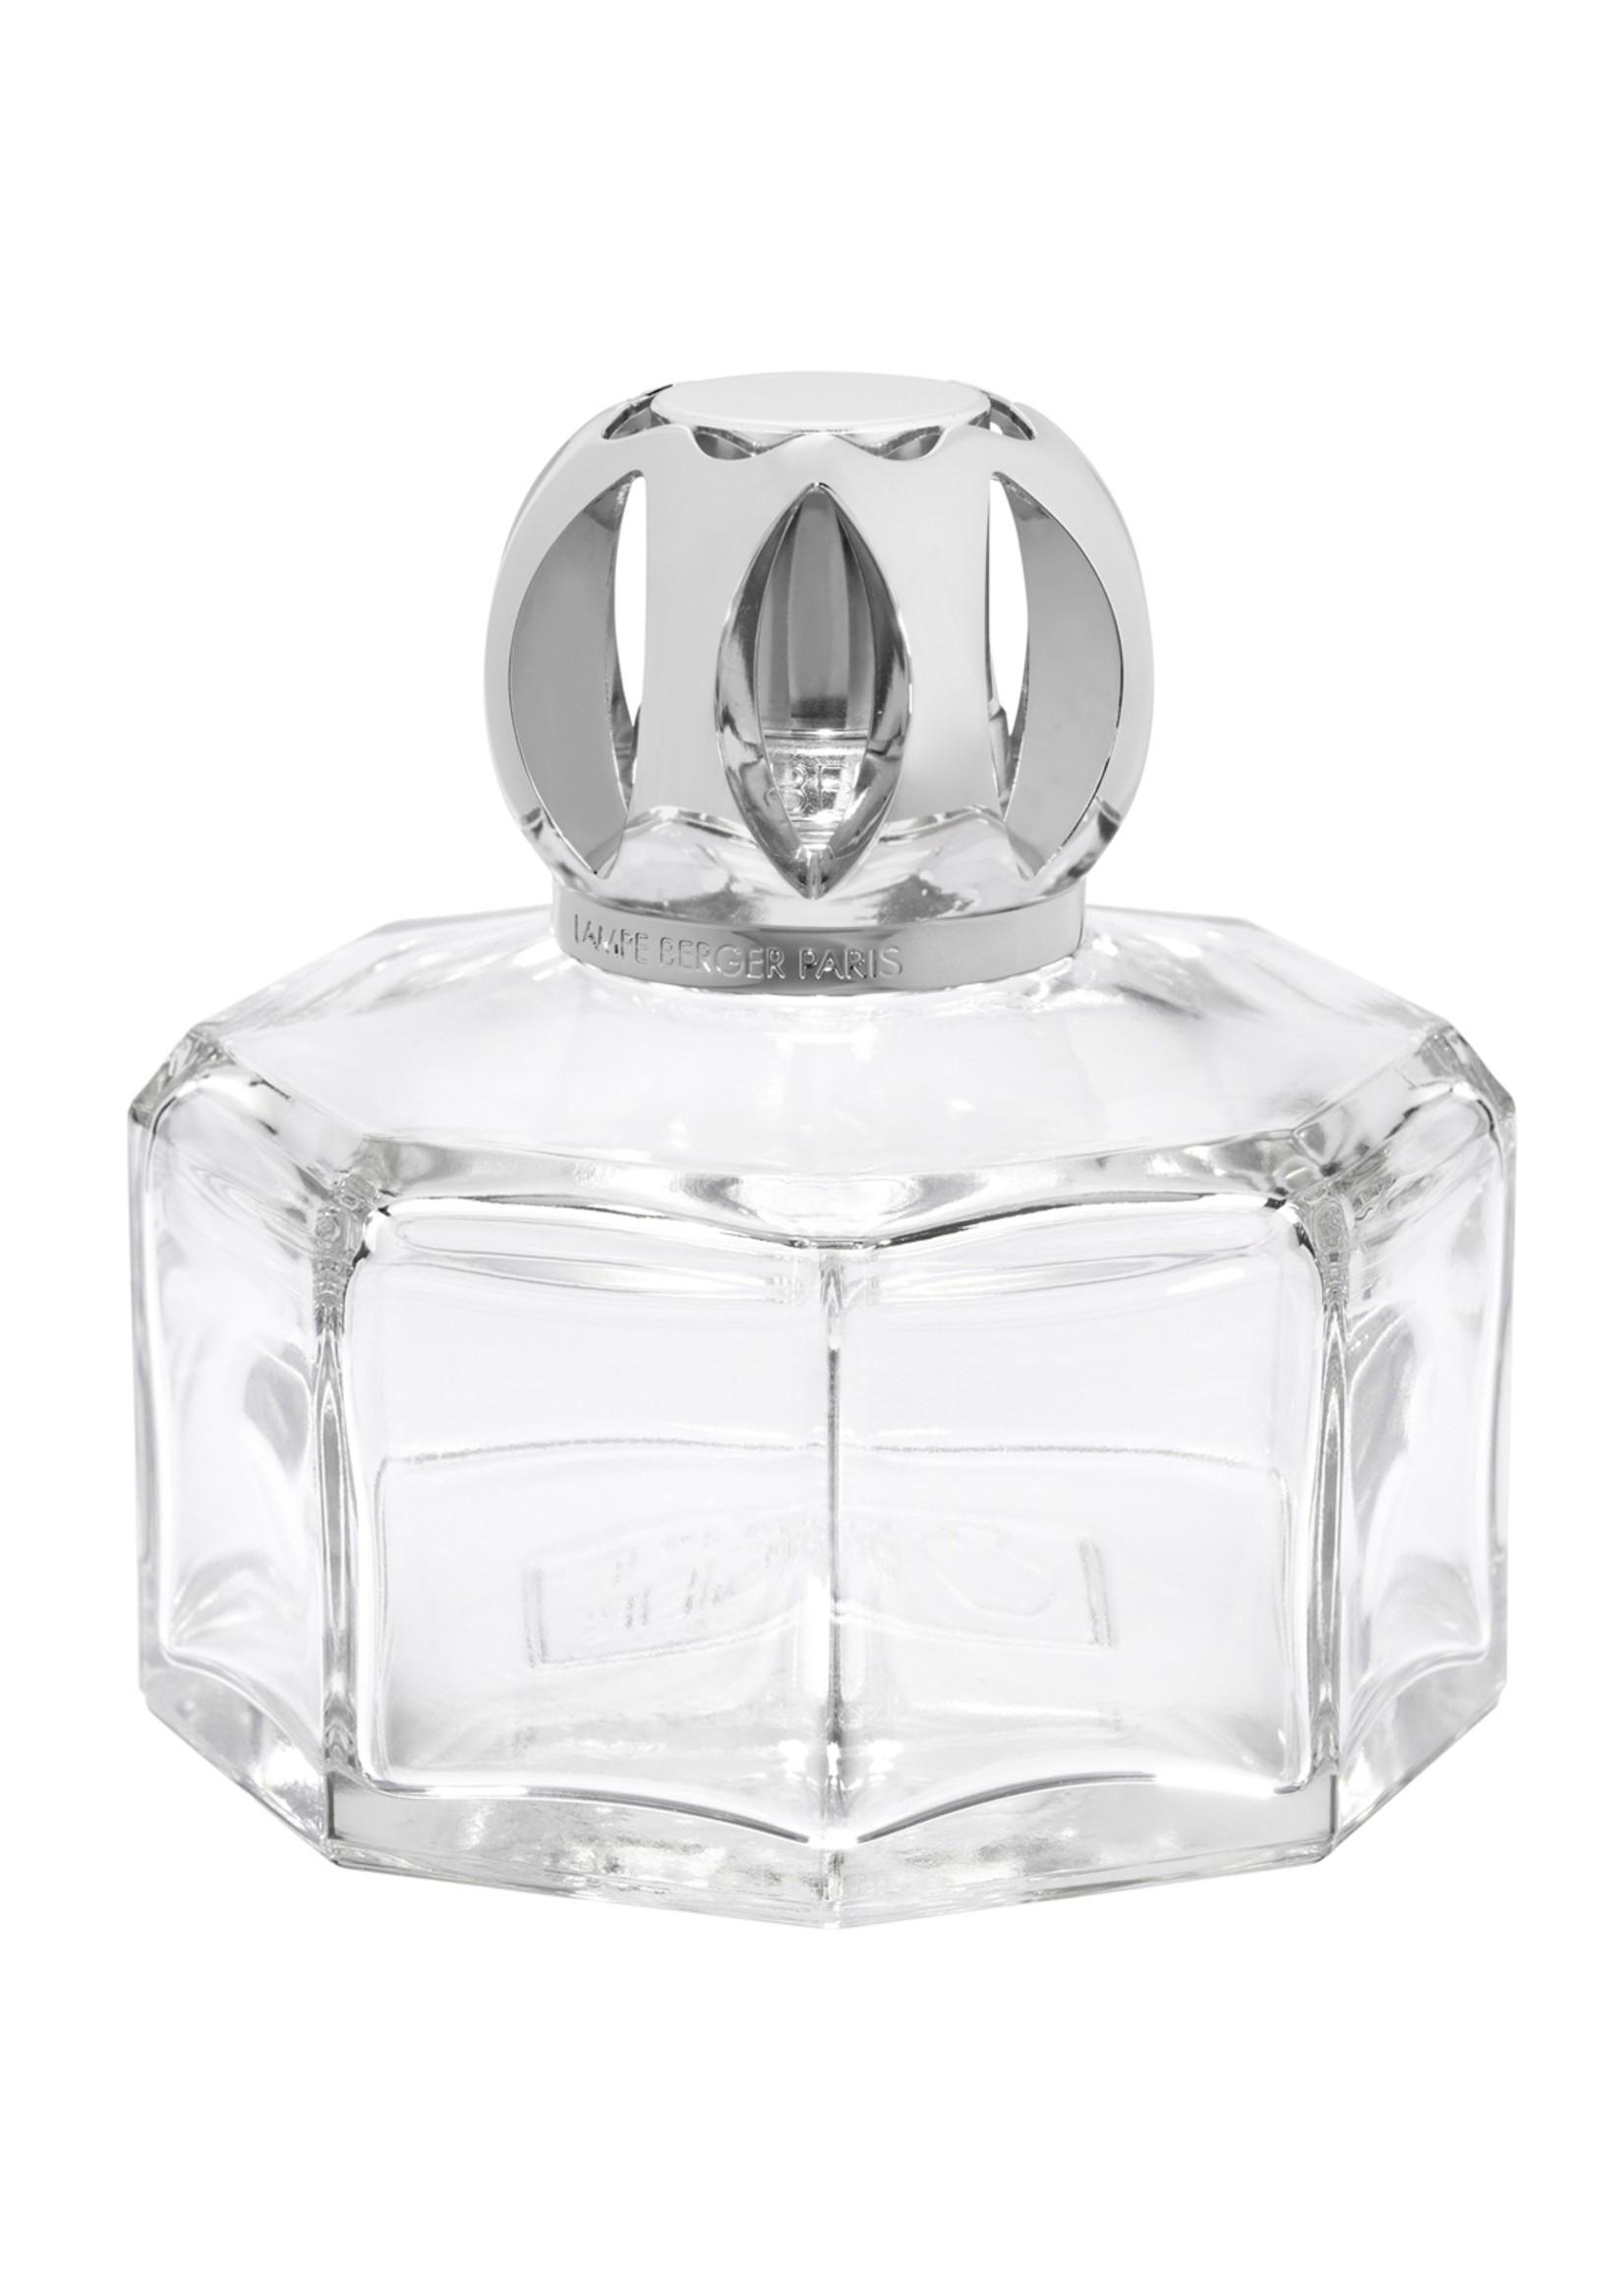 Maison Berger Secret Clear Gift Set